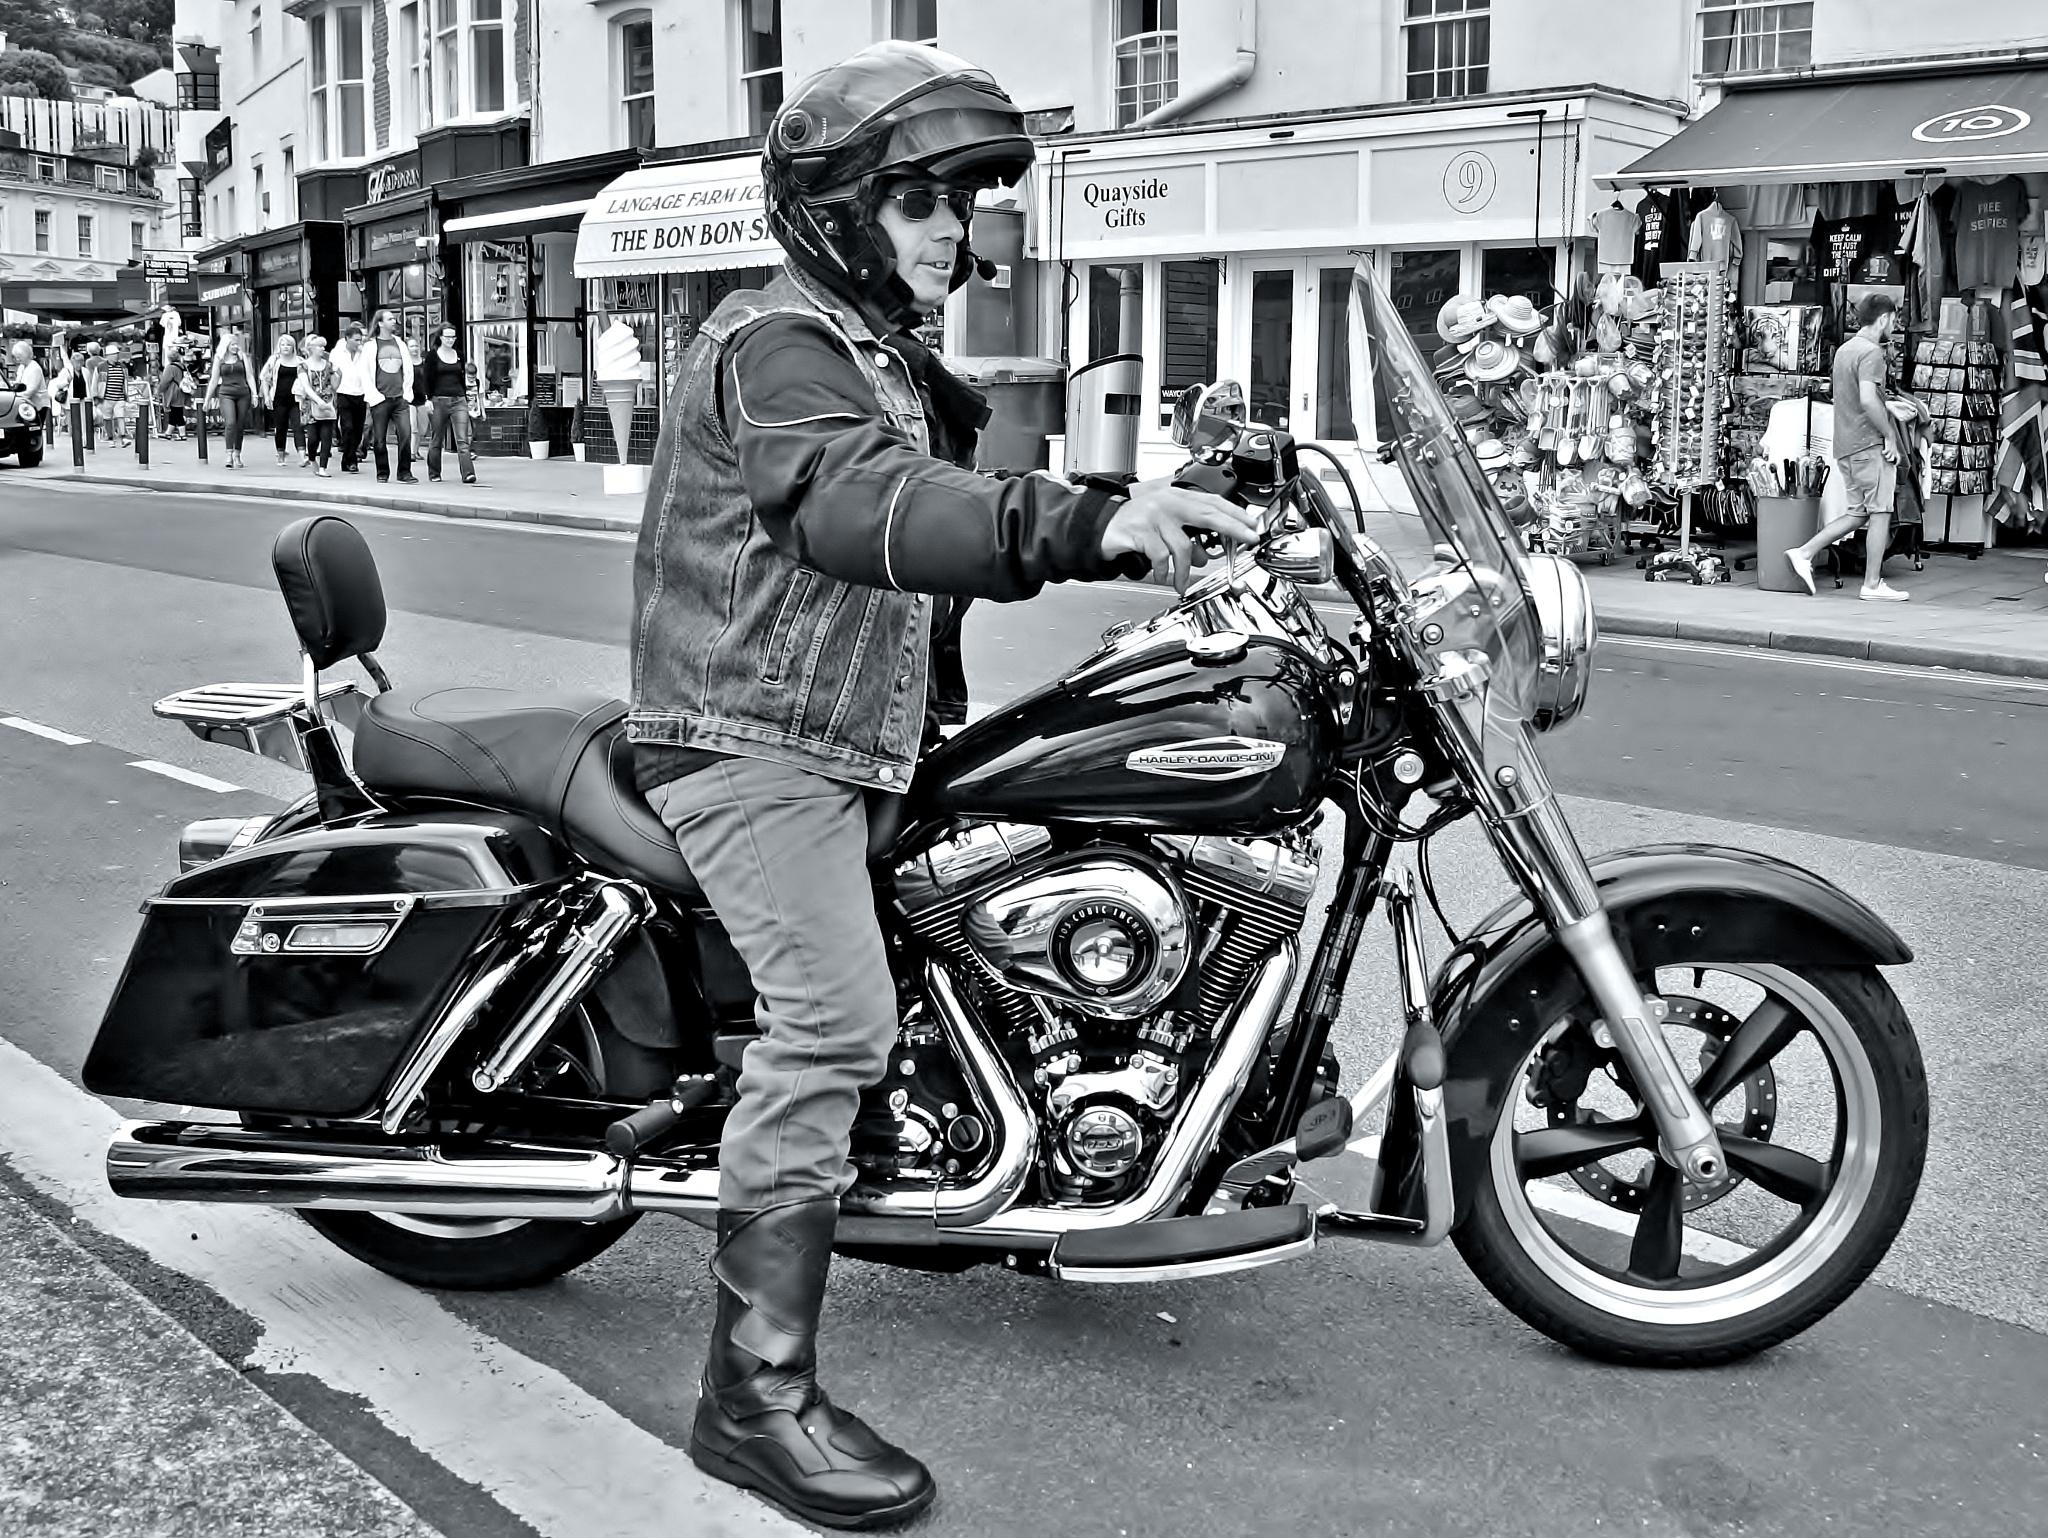 Harley Rider - Monochrome by paul.hosker